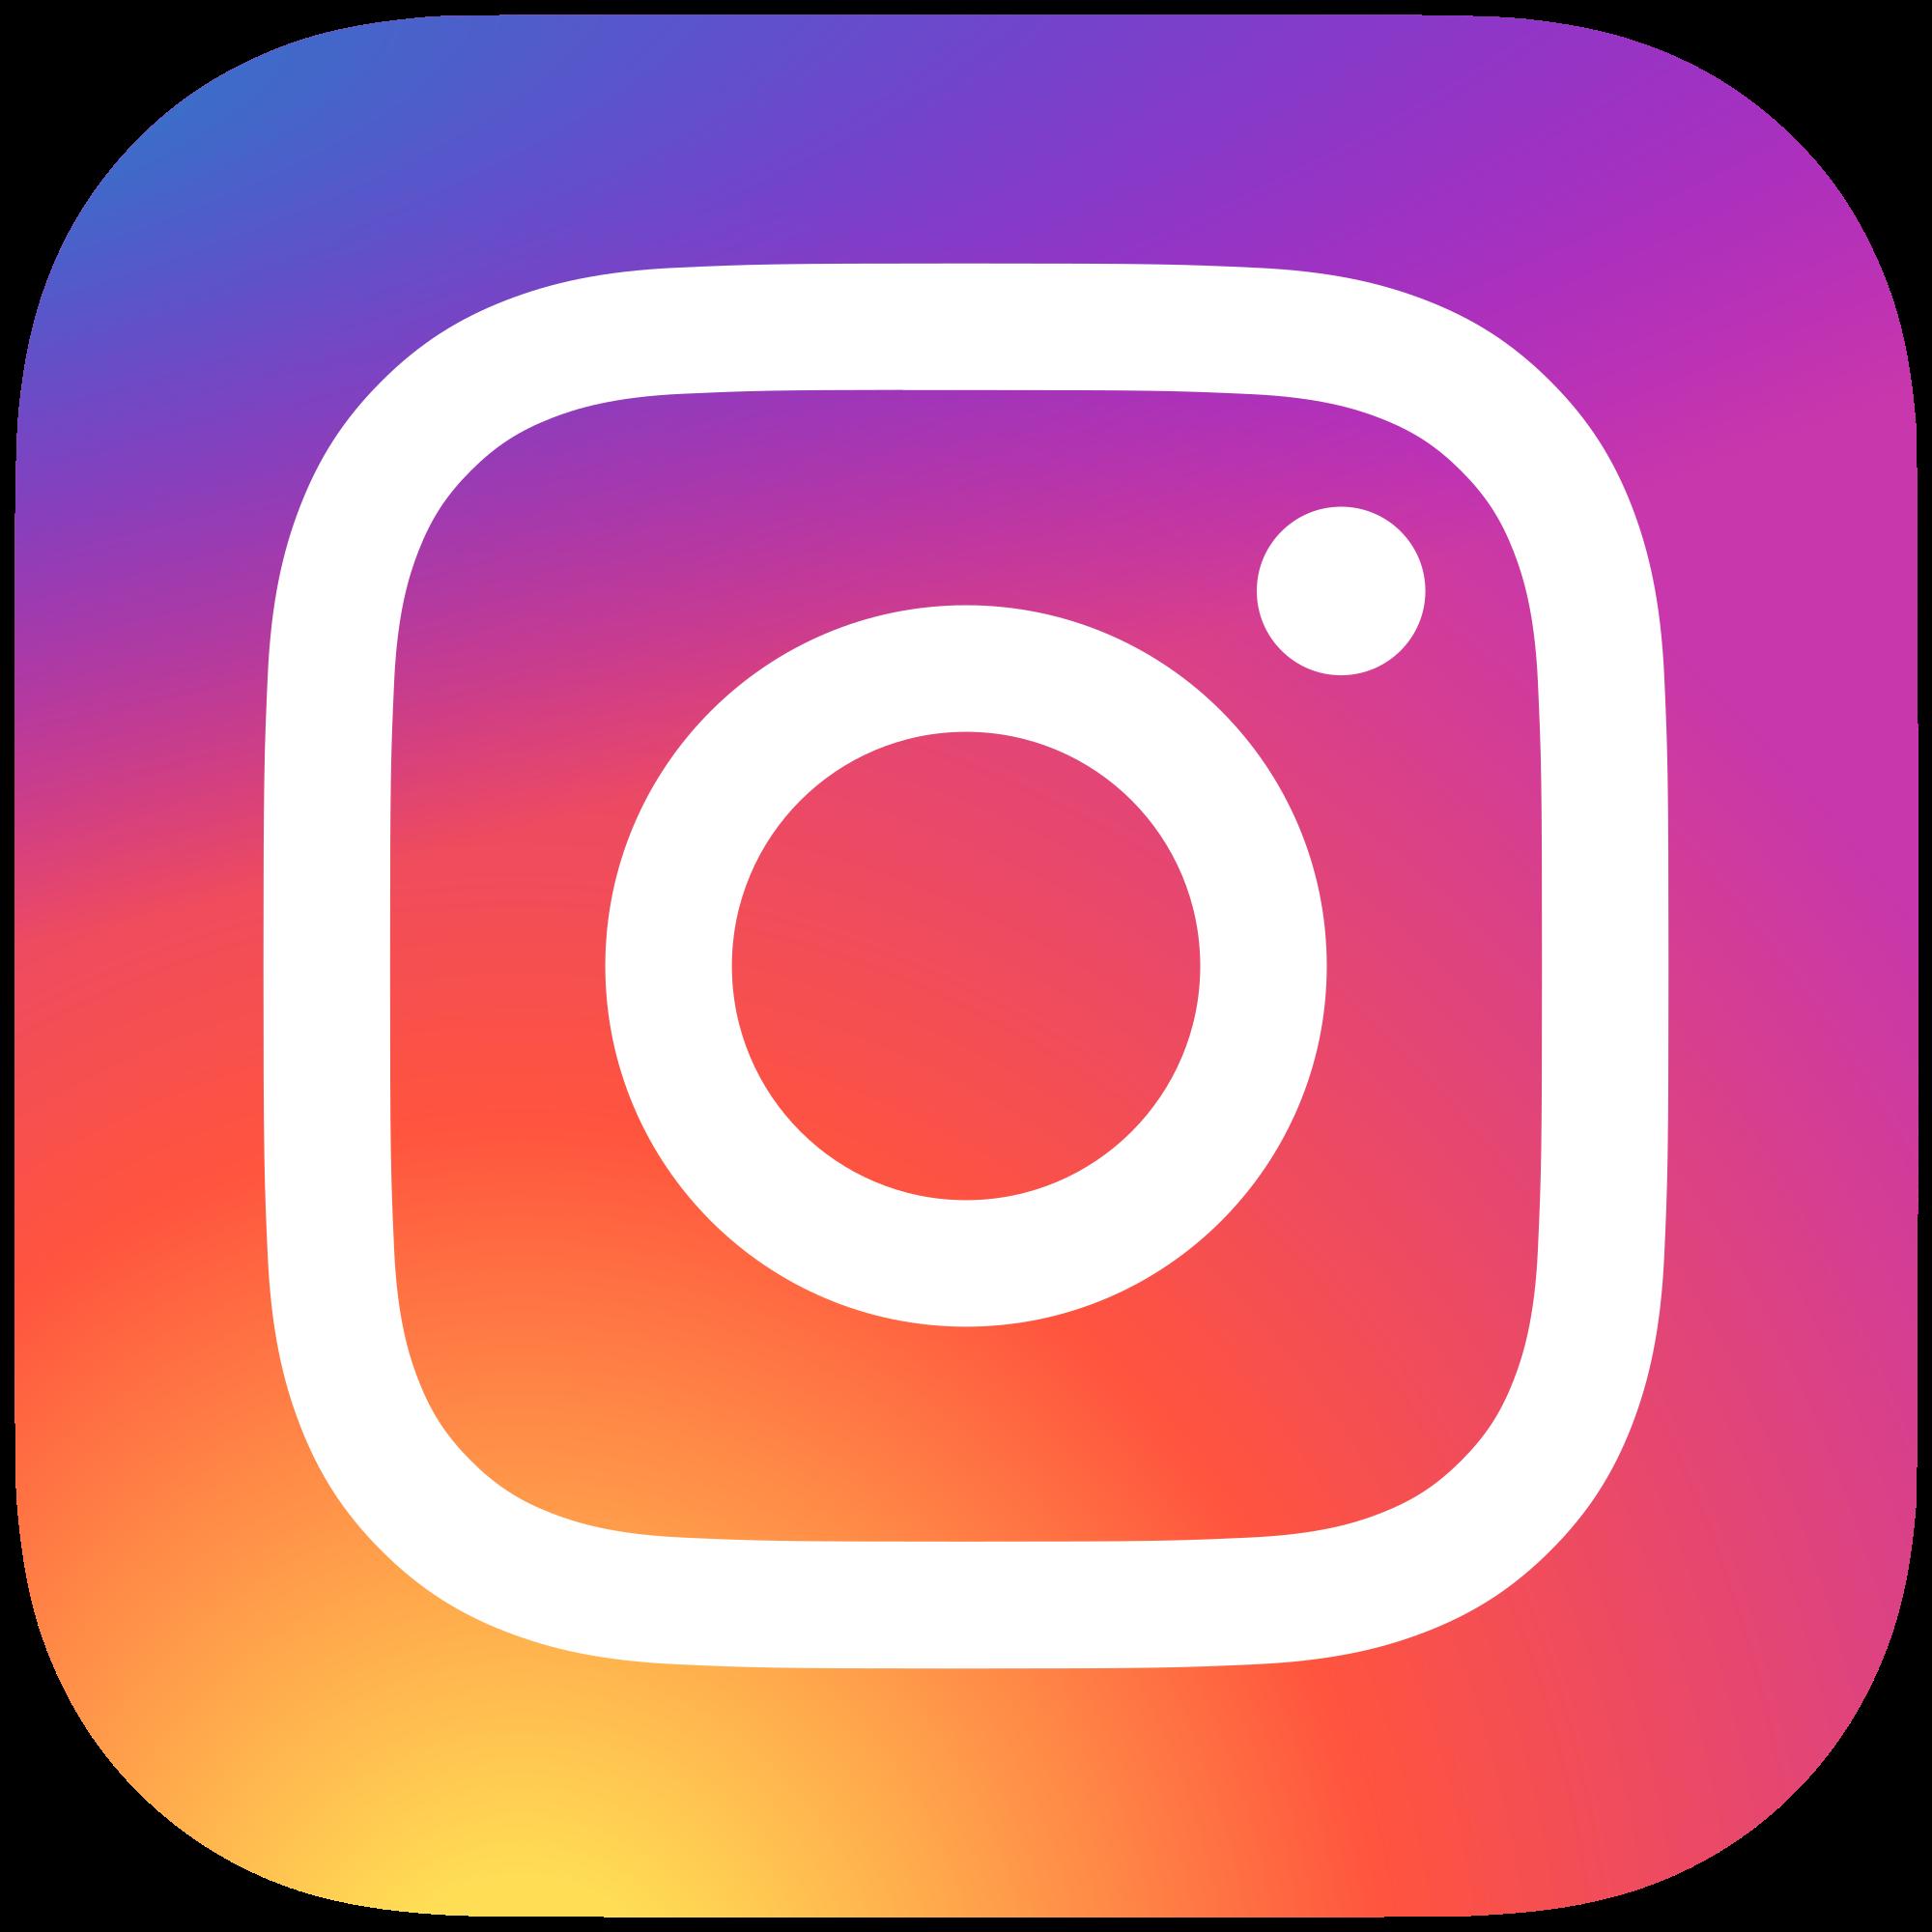 Open PlusPng.com  - Logo Instagram PNG